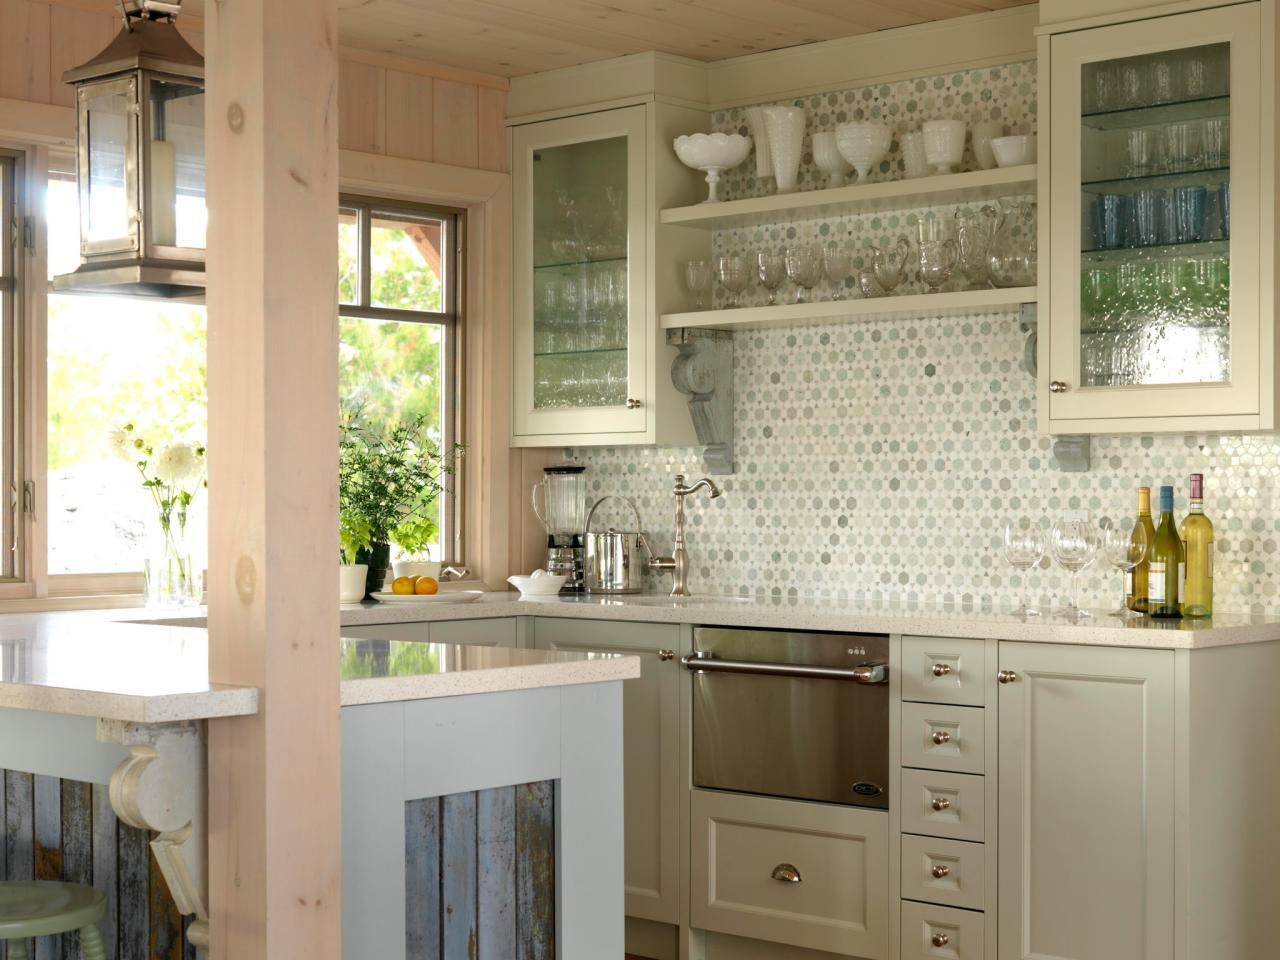 Kitchen Cabinet Door Design Ideas